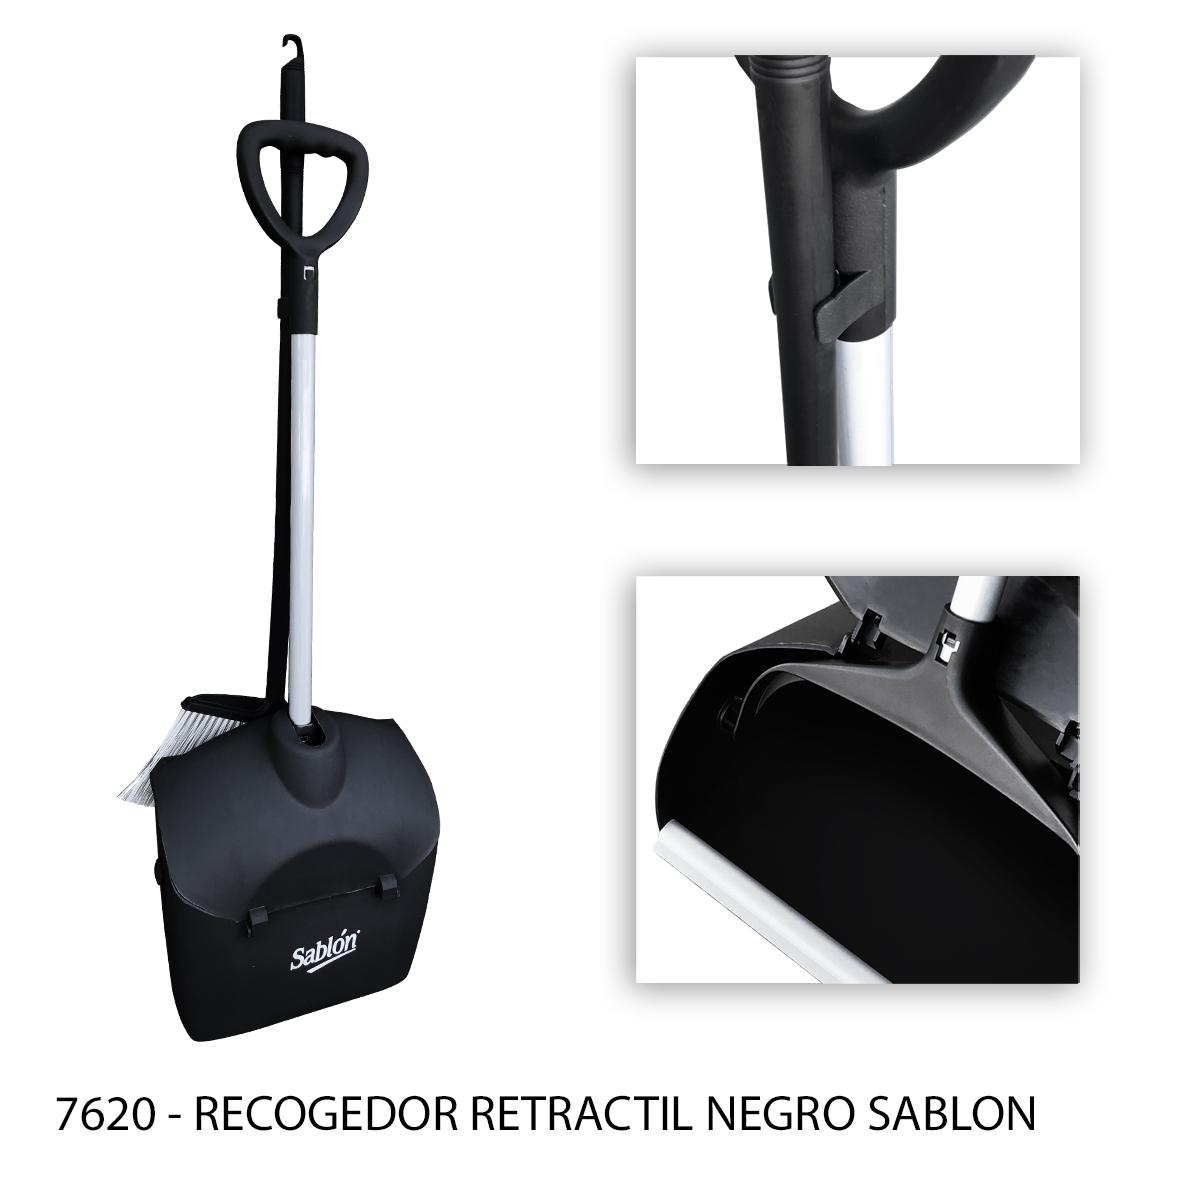 Recogedor de basura retractil negro modelo 7620 - Sablón